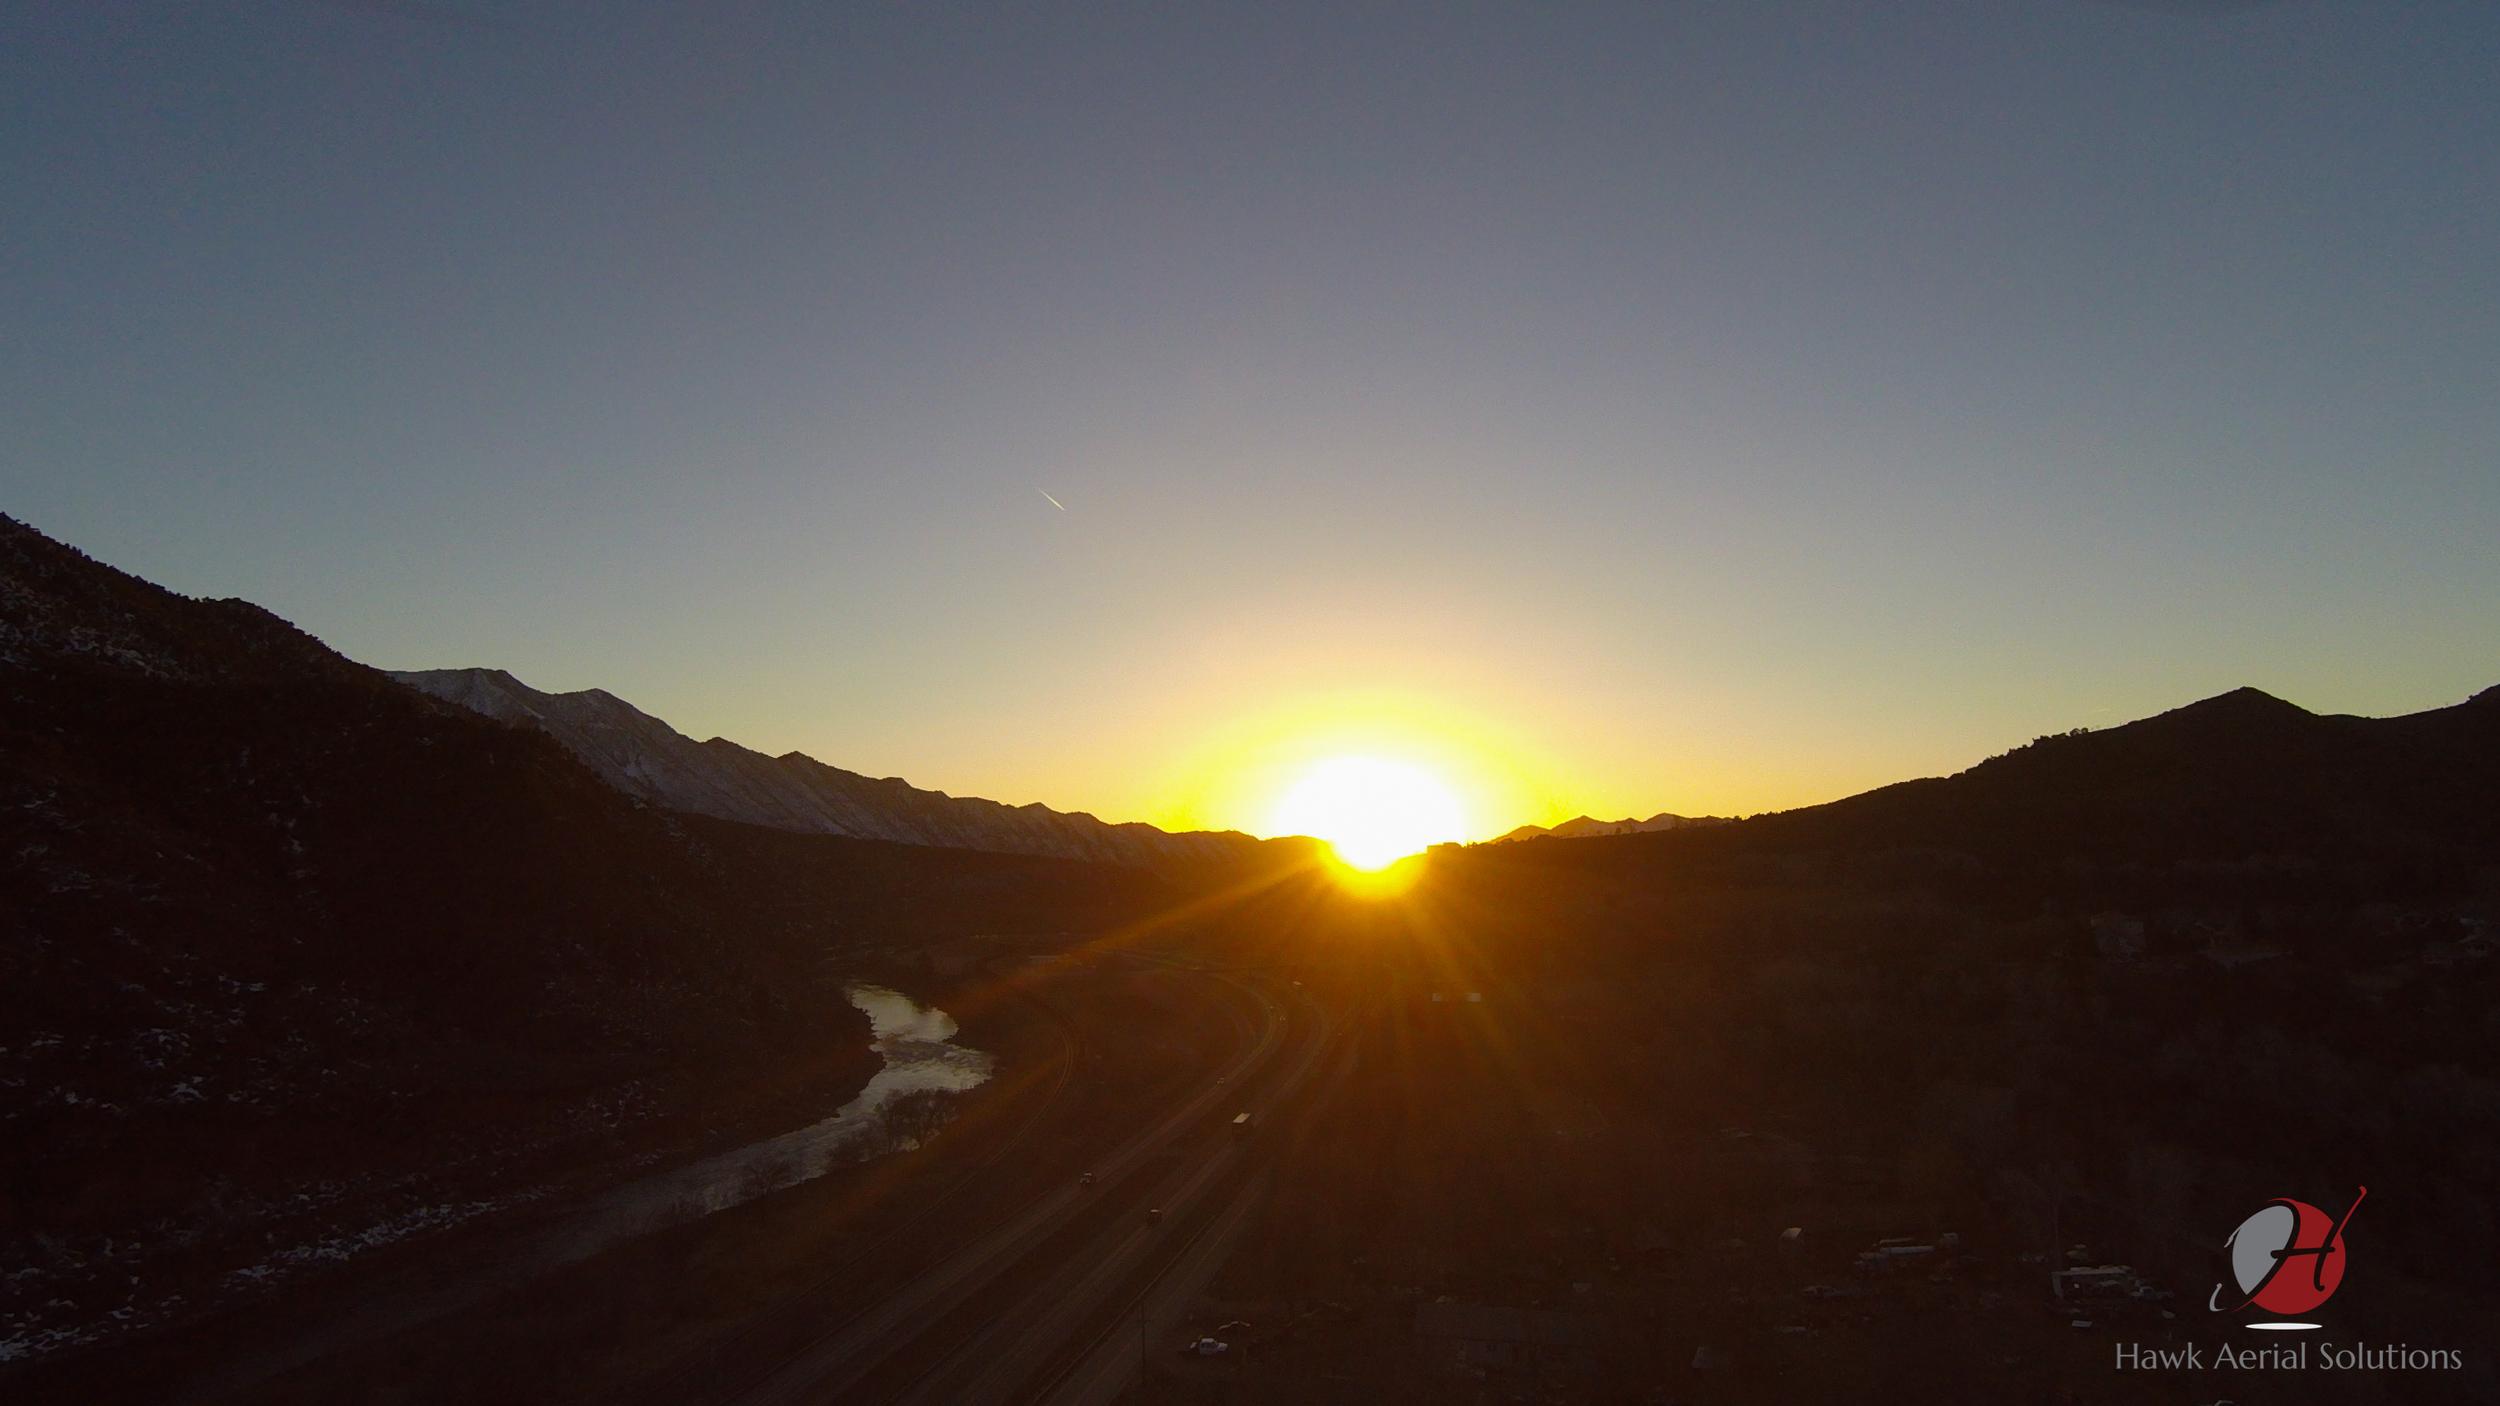 Sunset Home Edit.jpg